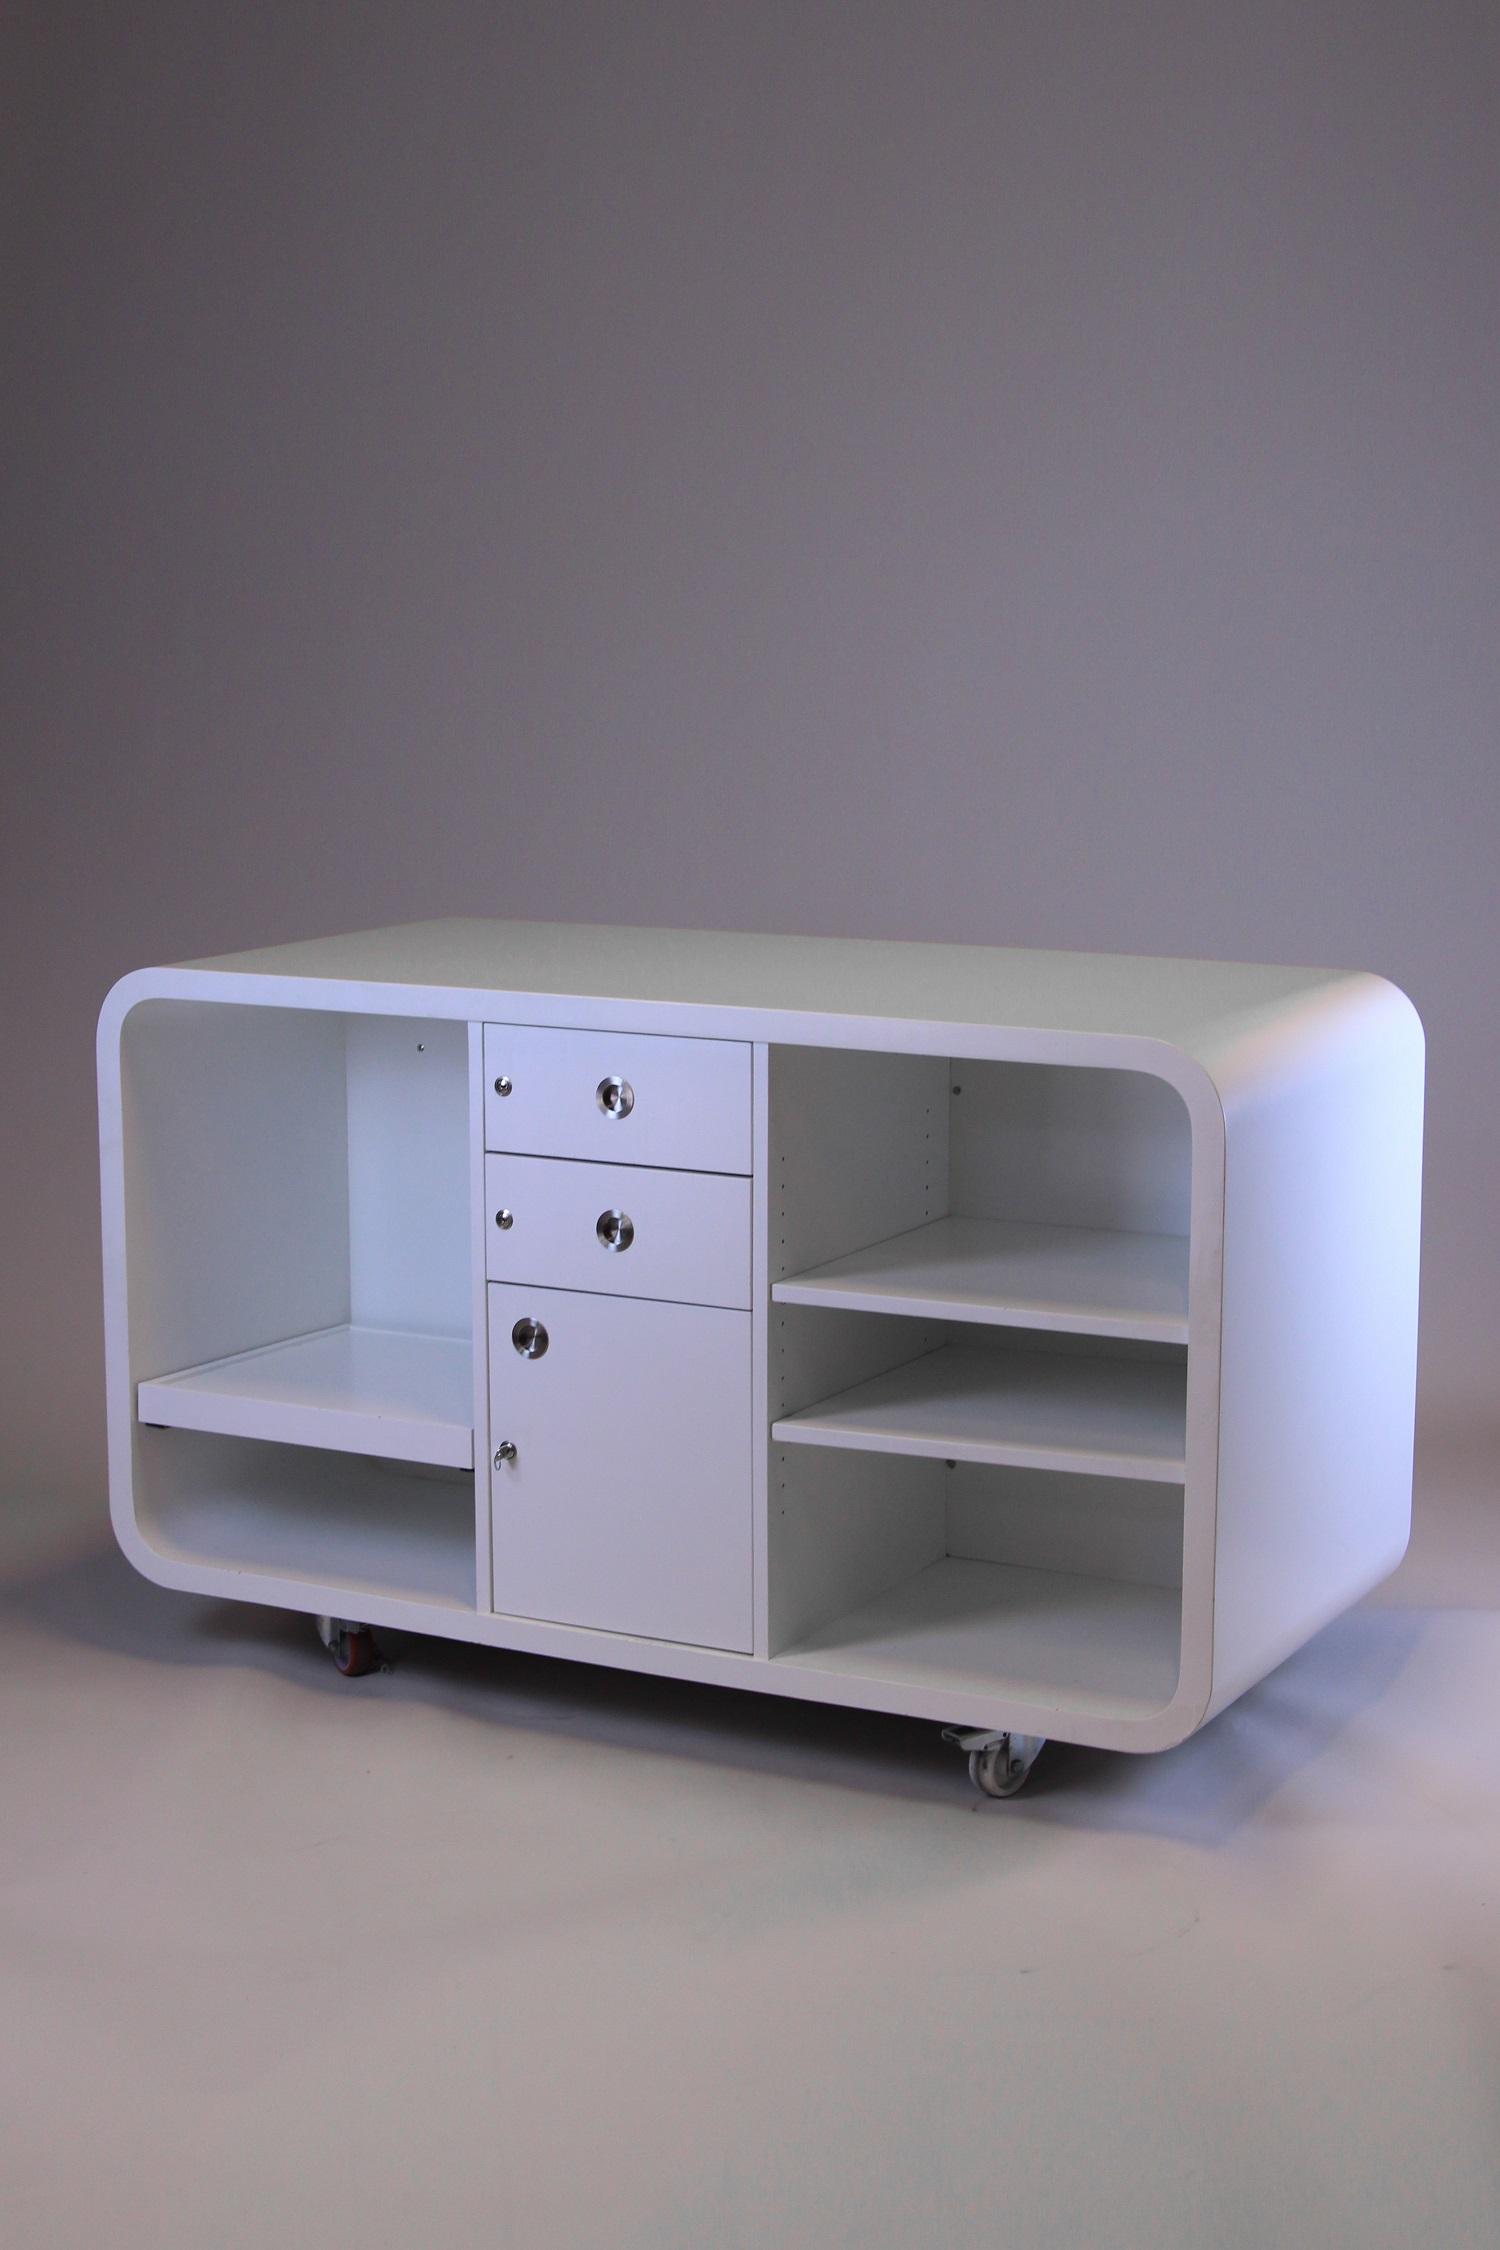 multifunktionstheke in wei mieten event mobiliar von deko tec. Black Bedroom Furniture Sets. Home Design Ideas